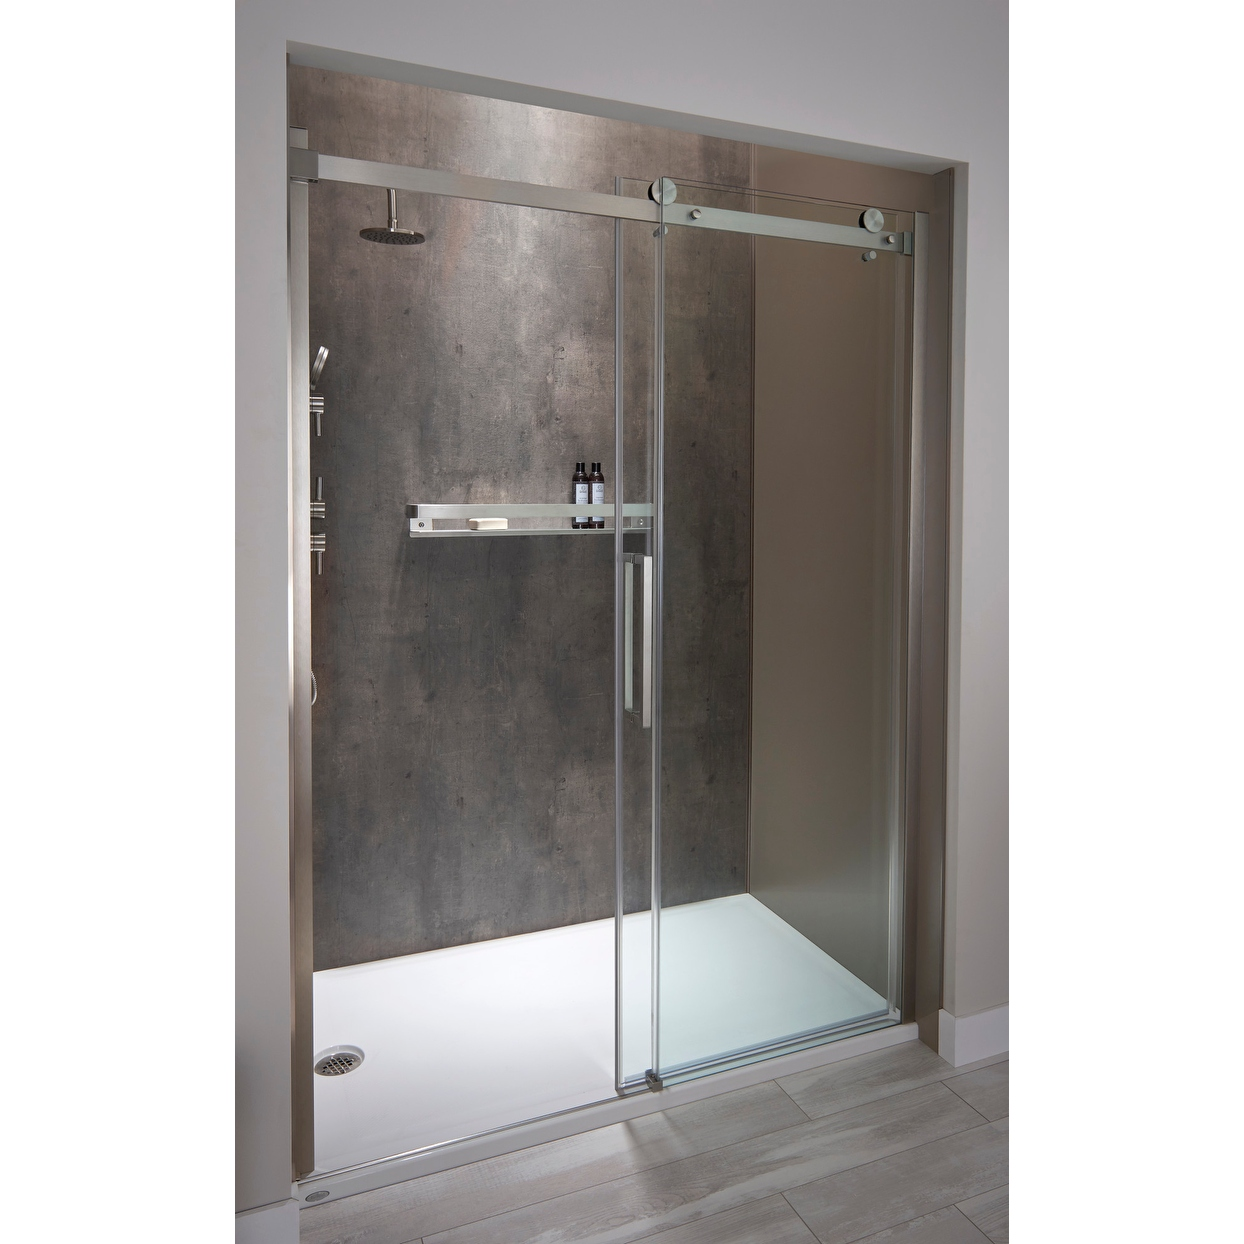 Jacuzzi Sx60 79 High X 60 Wide Sliding Semi Frameless Shower Door With Clear Glass